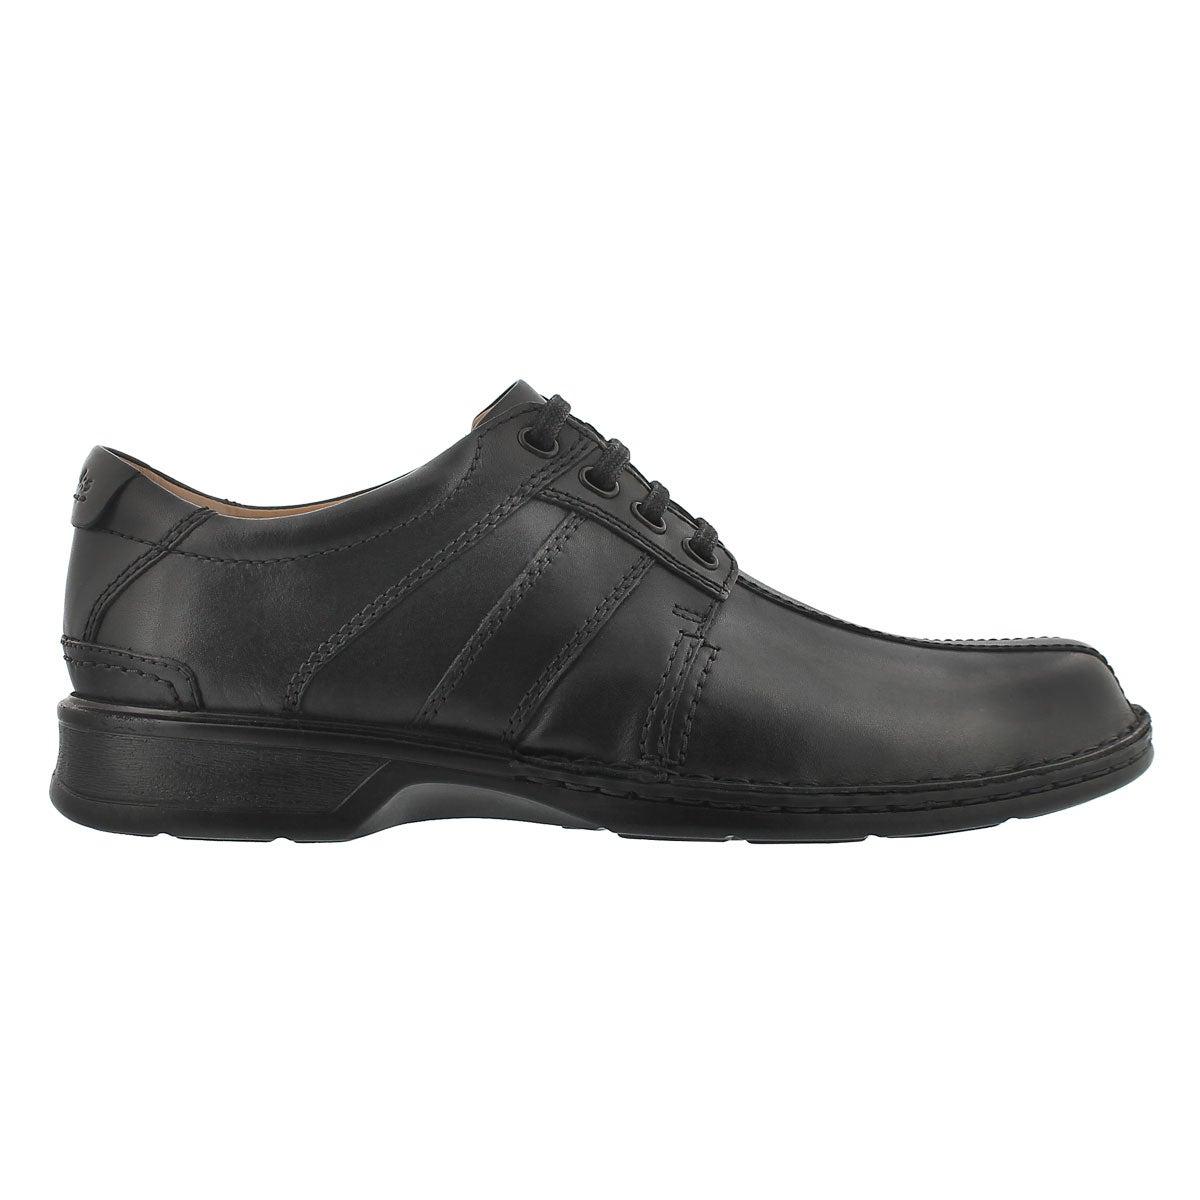 Chaussures hab. Touareg Vibe, noir, hom